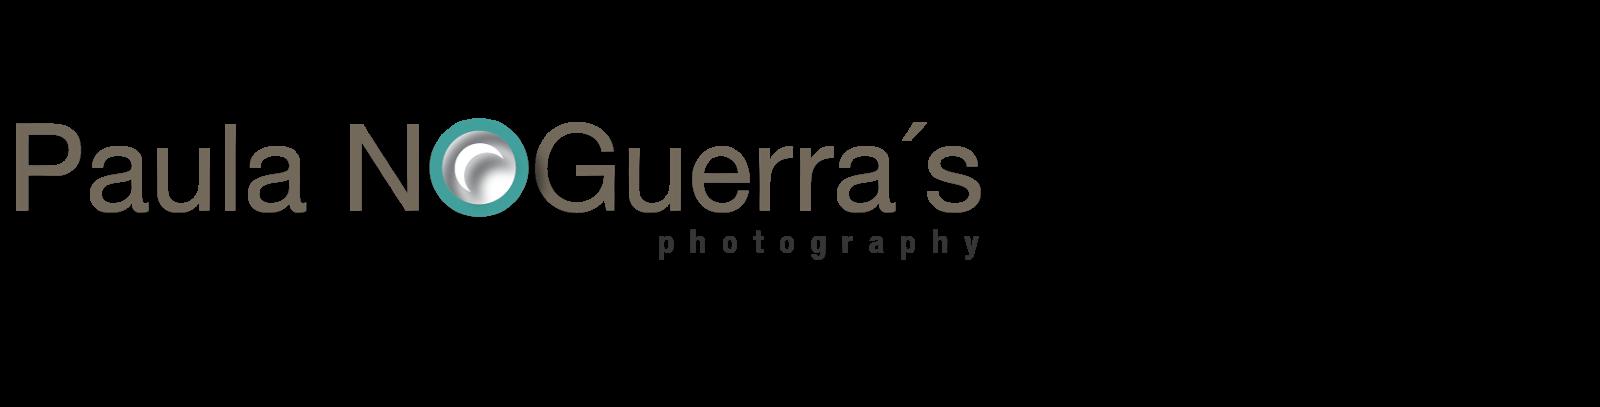 Paula NoGuerra's Photography